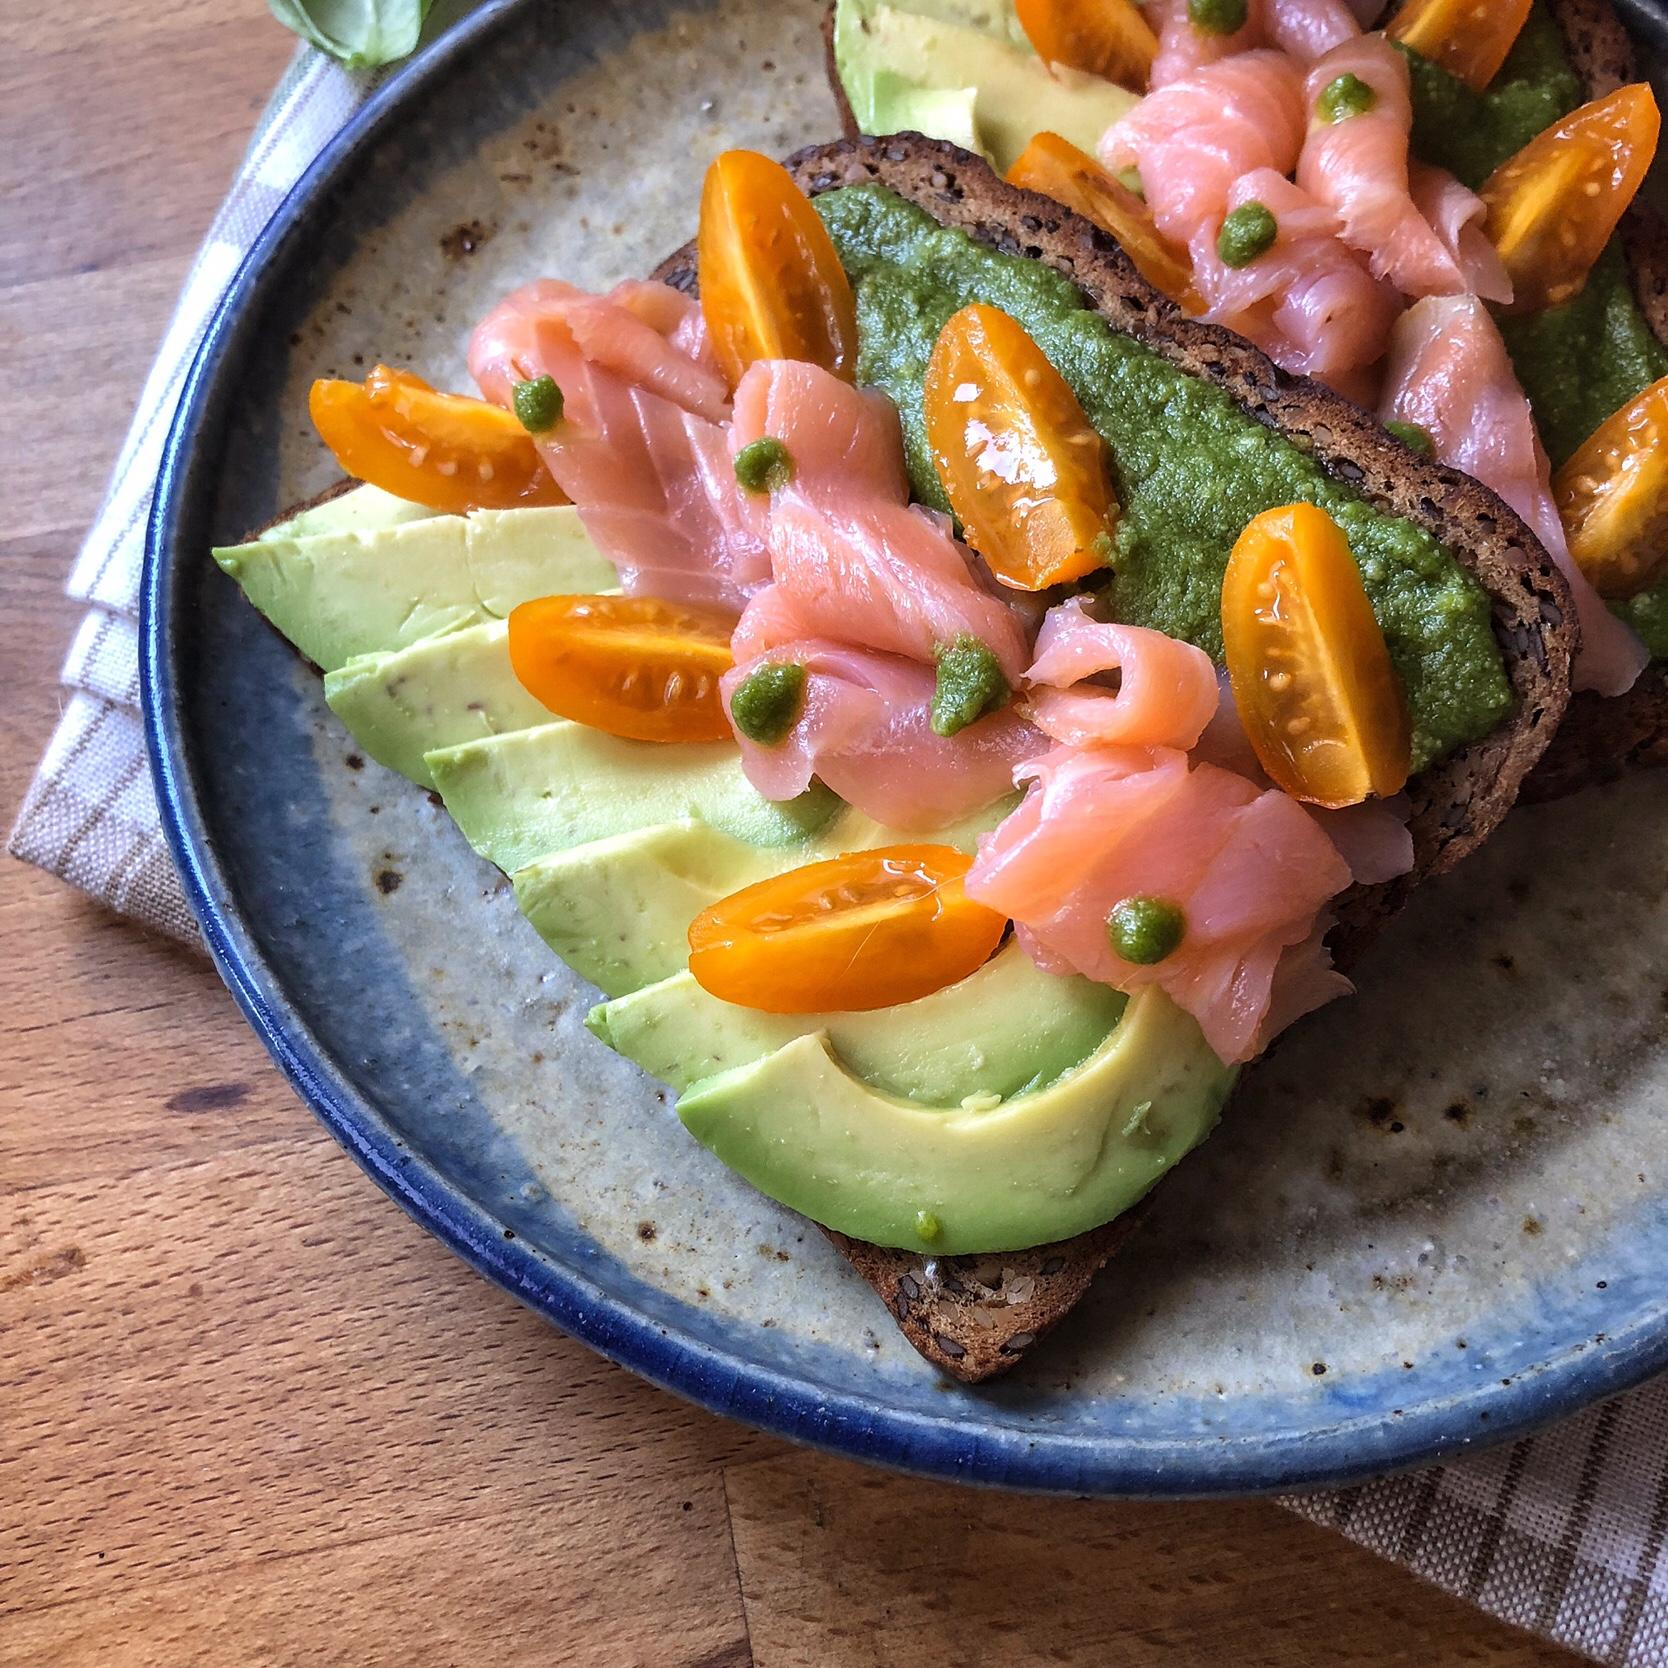 Avocado toast con salmone e pesto